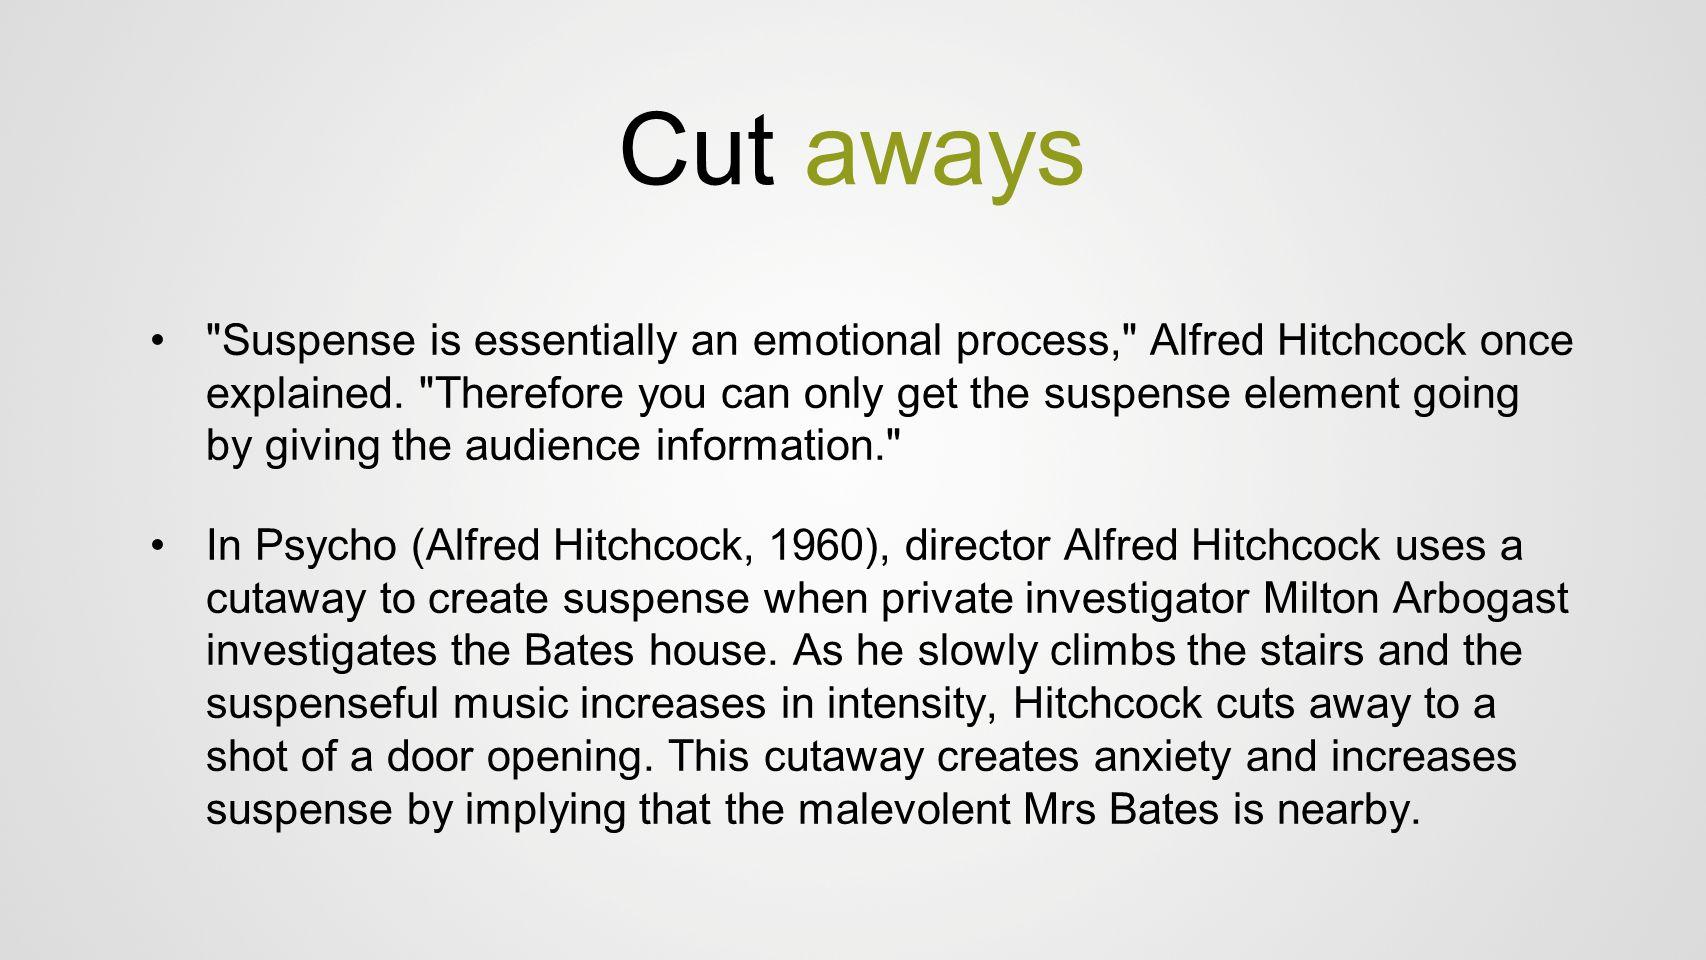 Cut aways